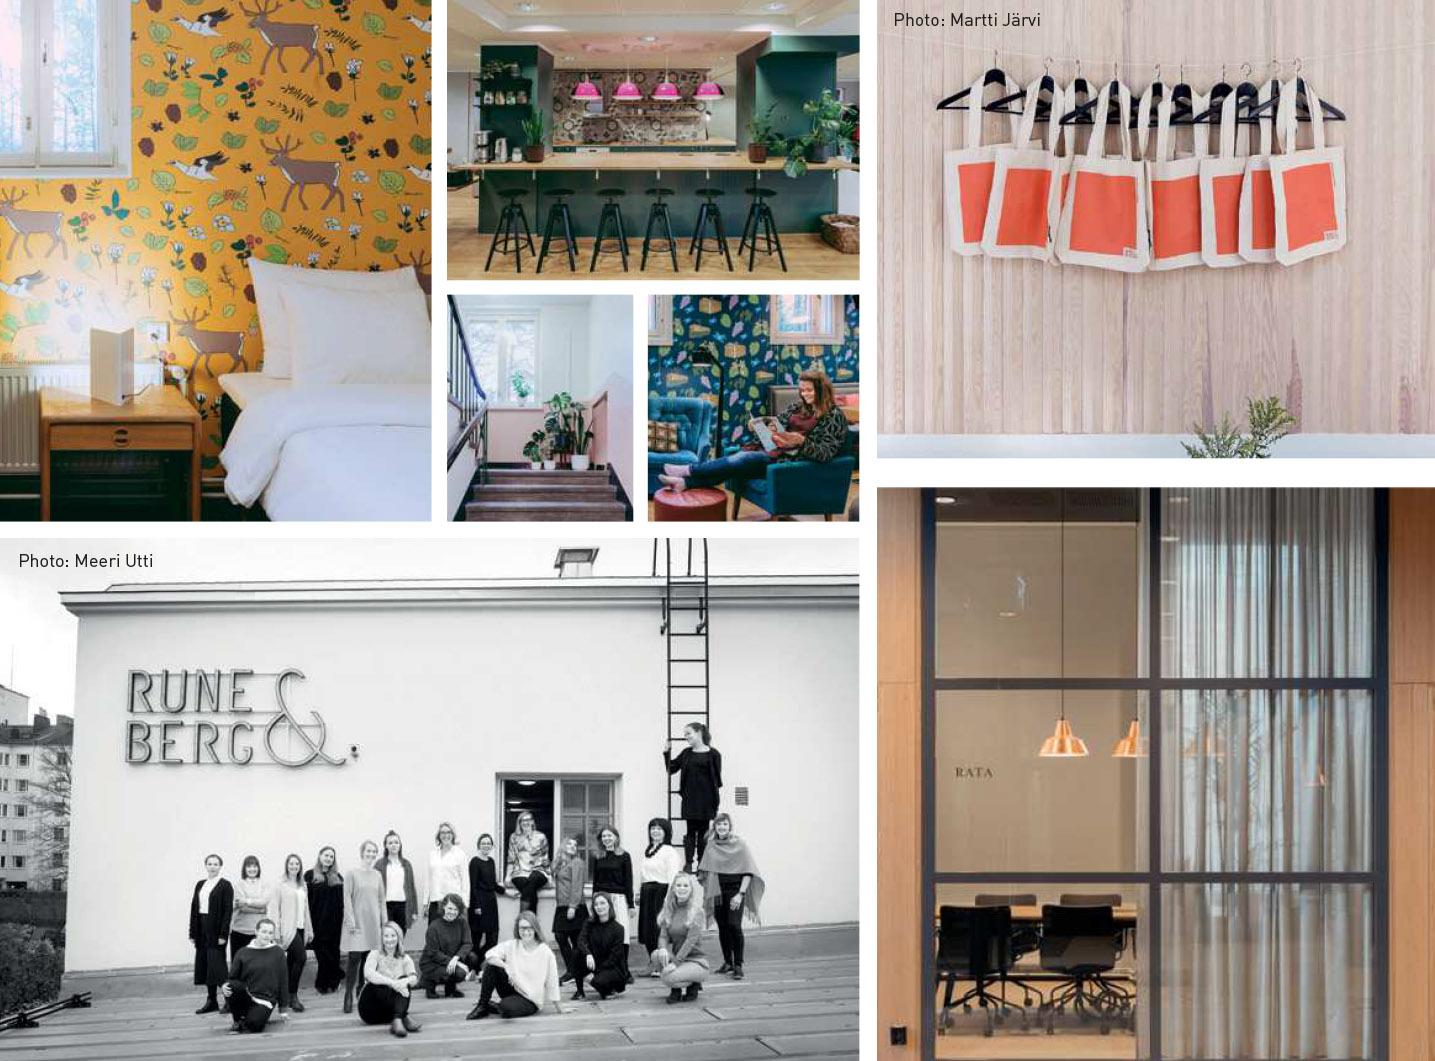 Rune & Berg Designs, Designs that make a change -Scan Magazine